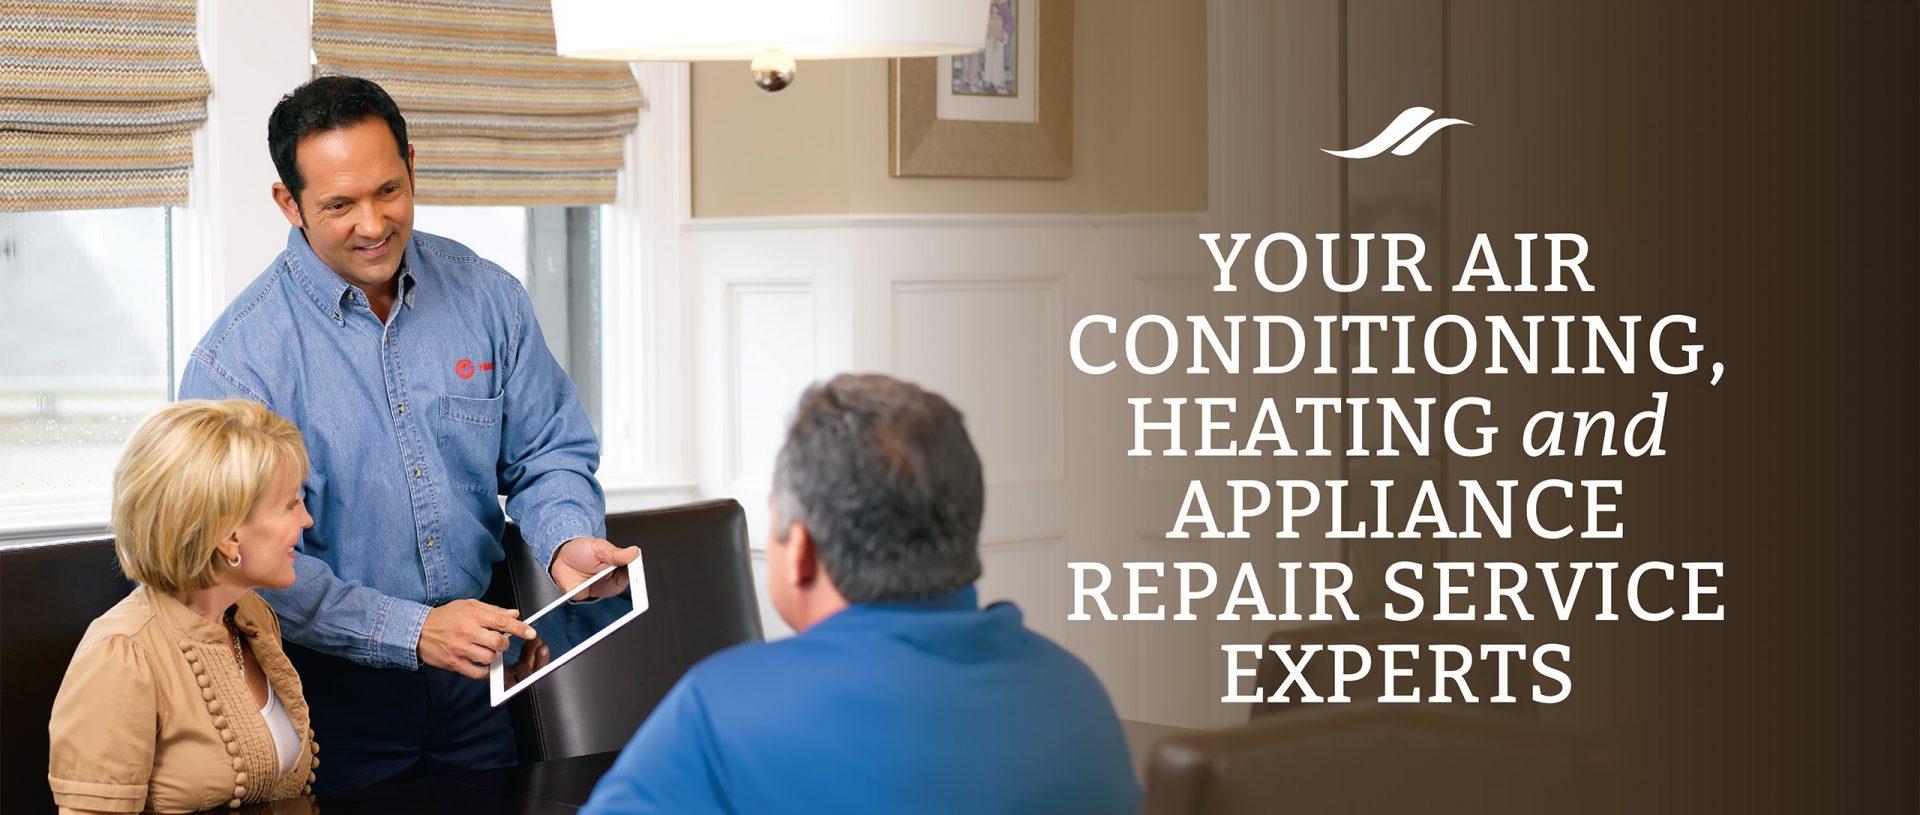 technician meeting with clients Beech Island Appliance Service Co Aiken SC Augusta GA heating air conditioning